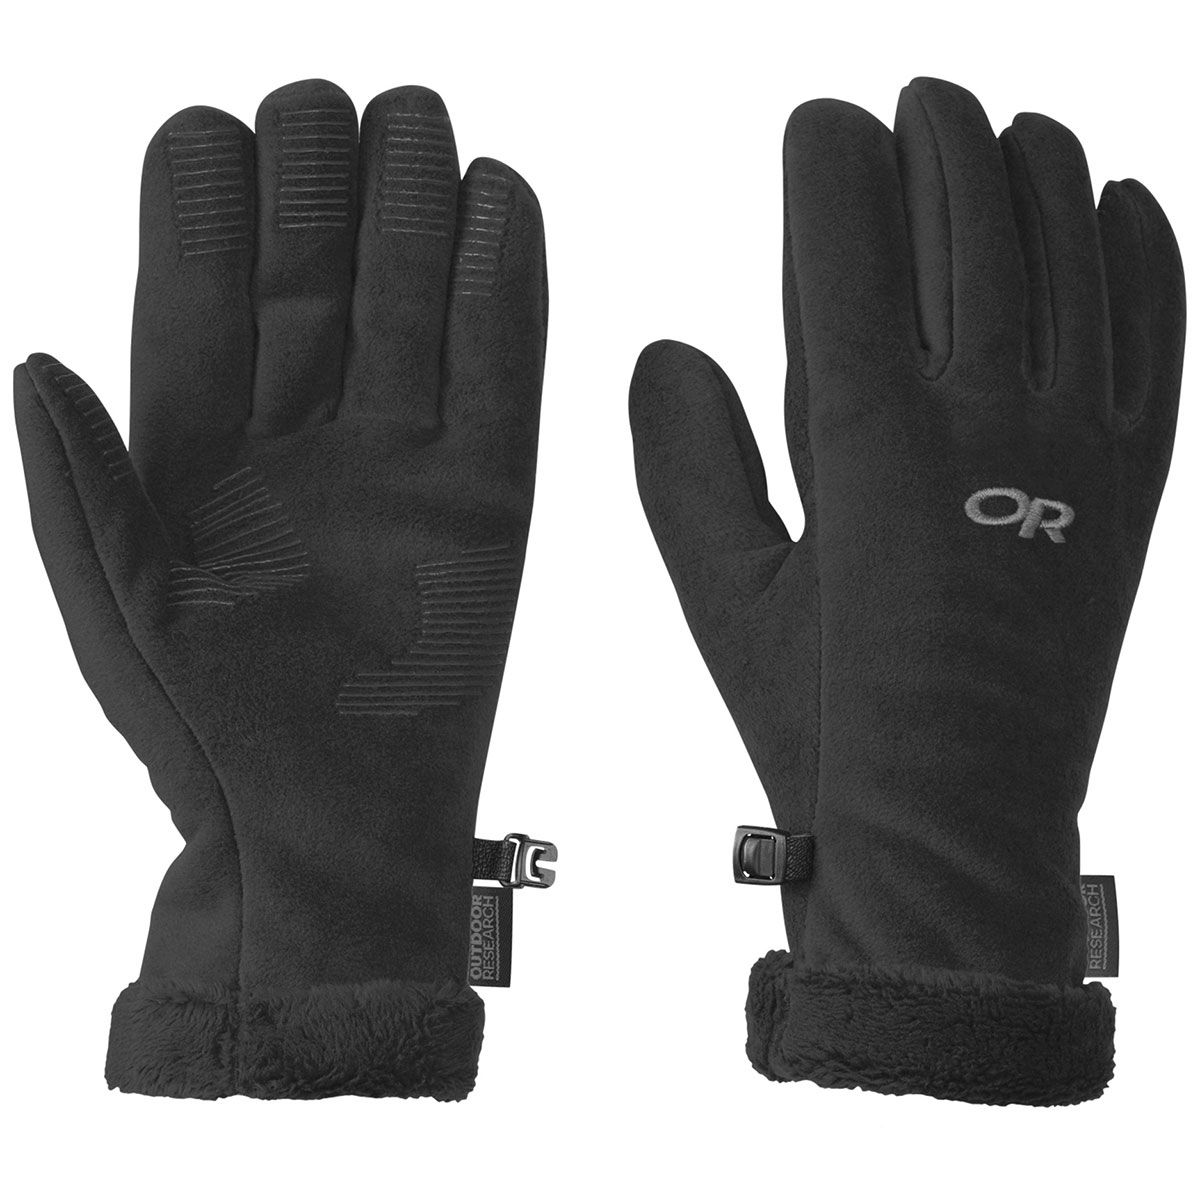 Outdoor Research Women's Fuzzy Sensor Gloves - Black, S